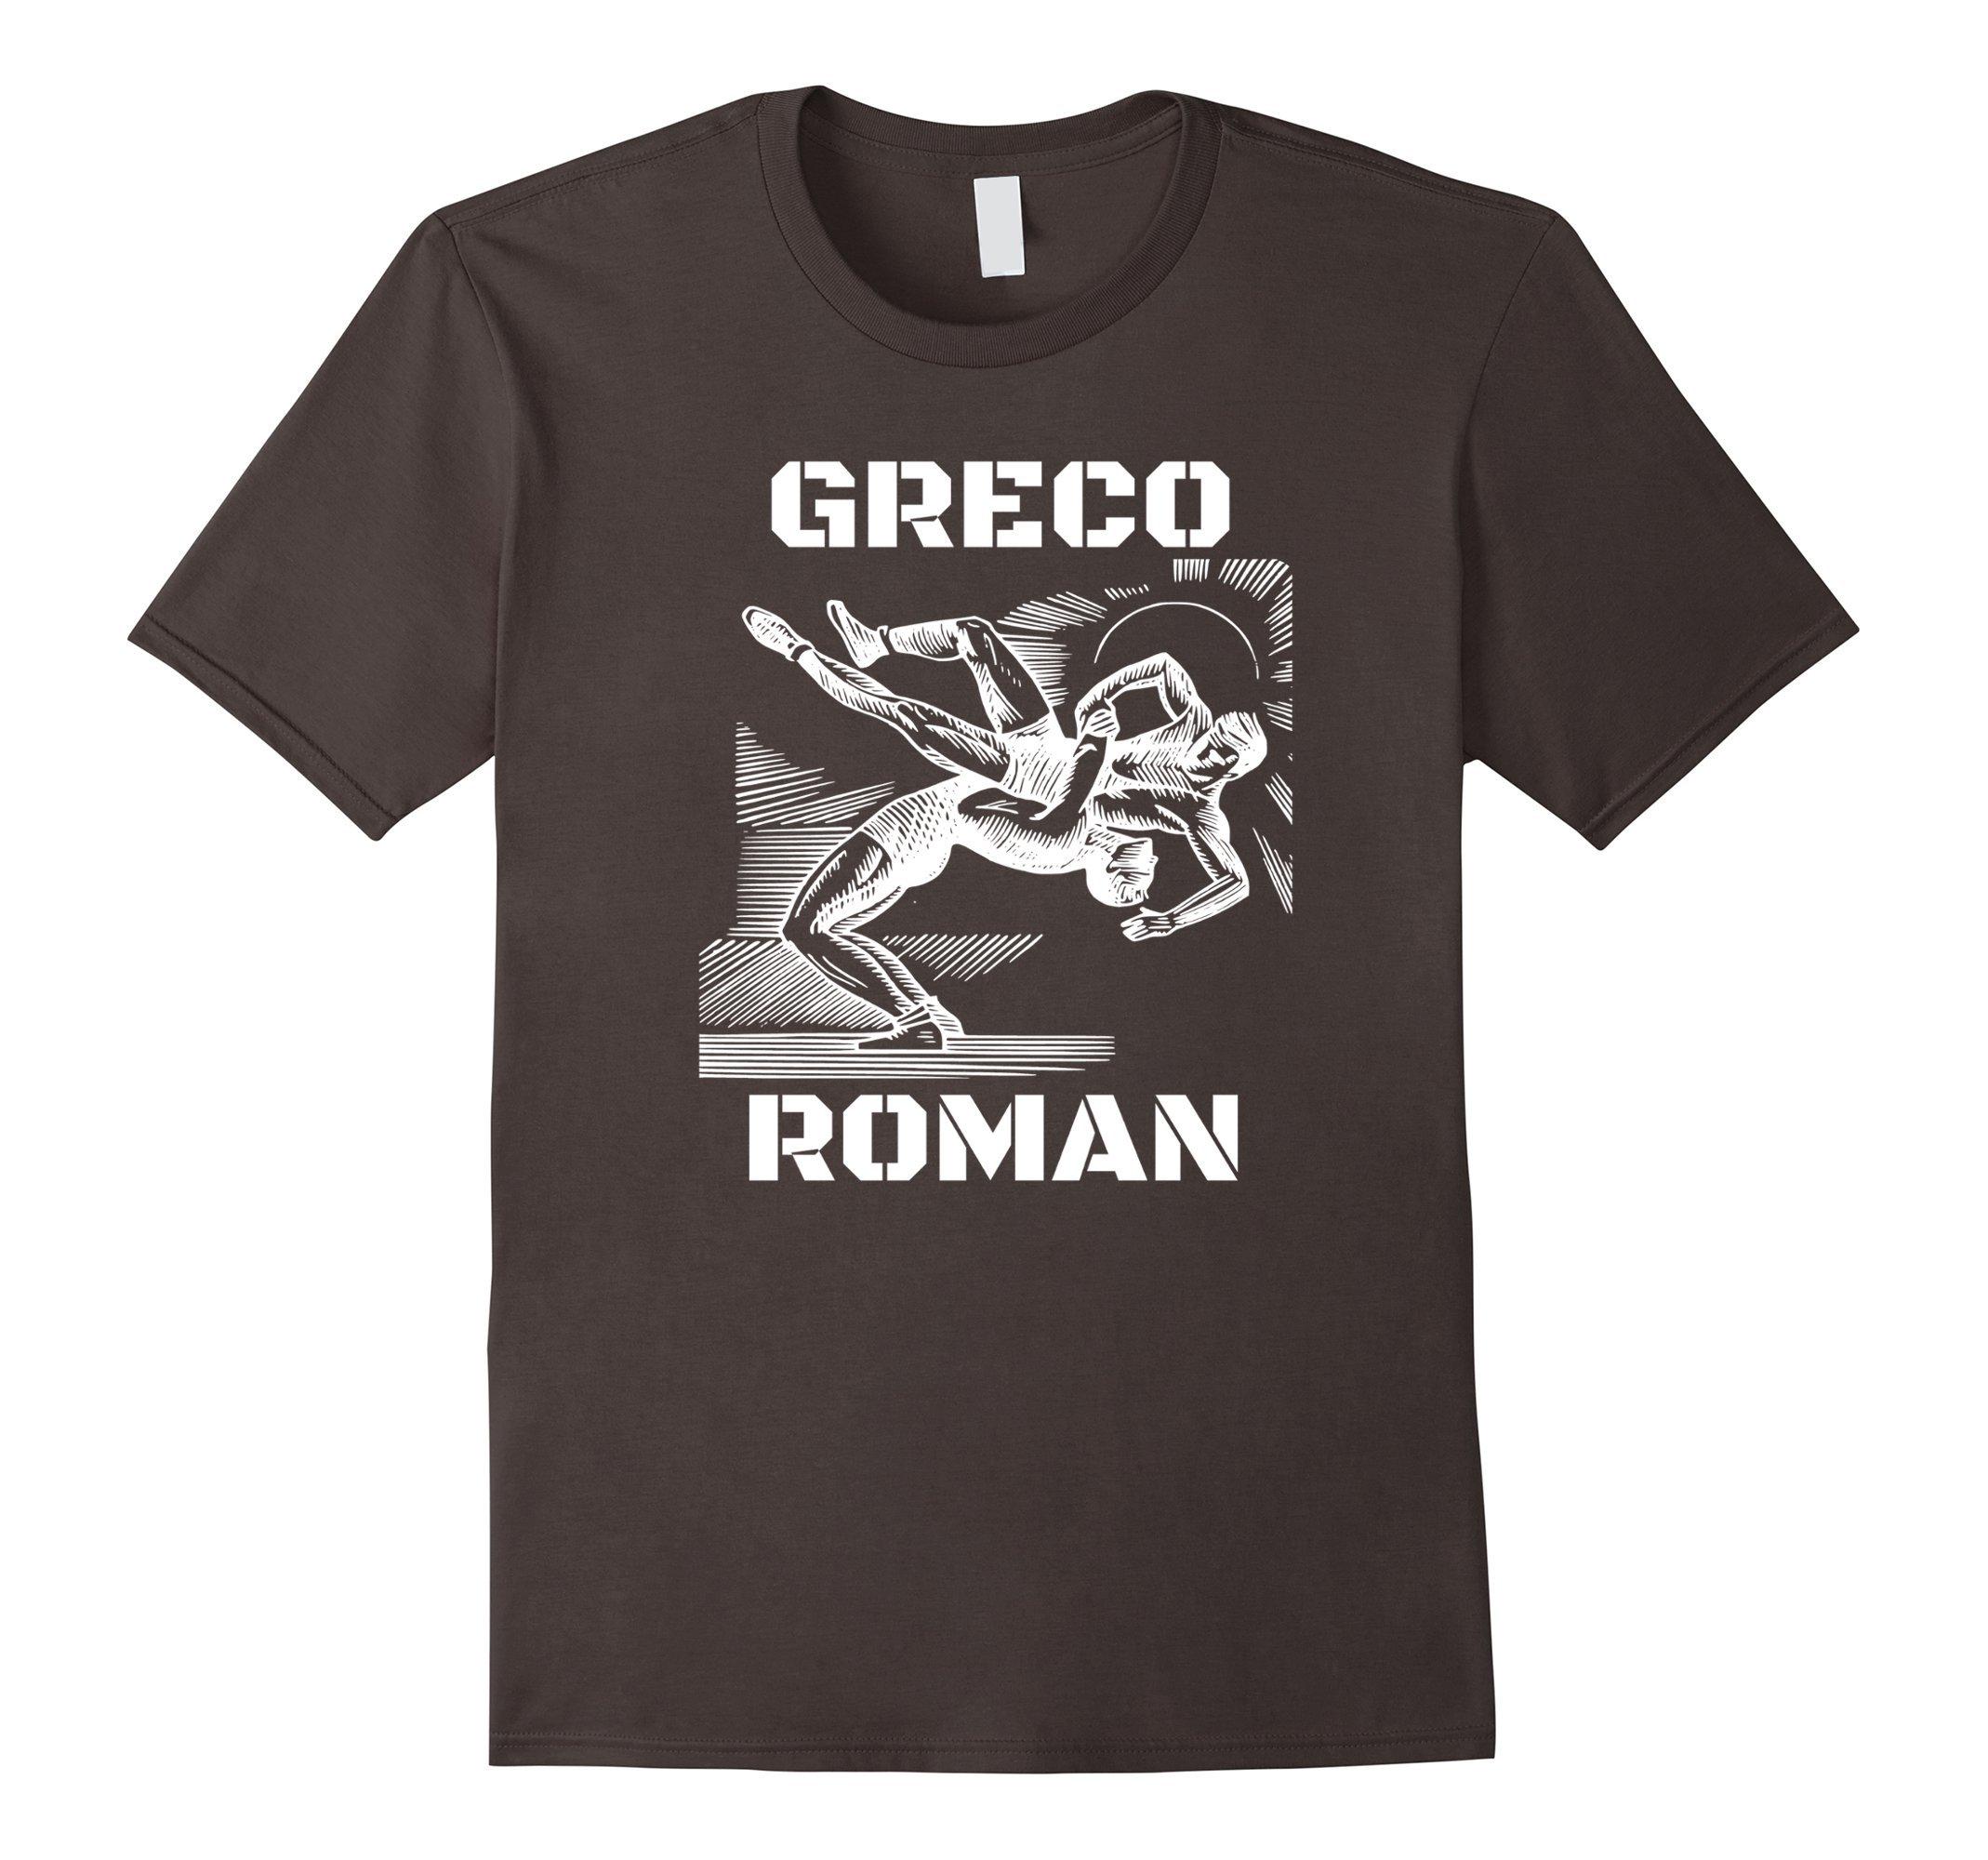 Mens Greco Roman Wrestling T-Shirt USA XL Asphalt by Greco Roman T-Shirt